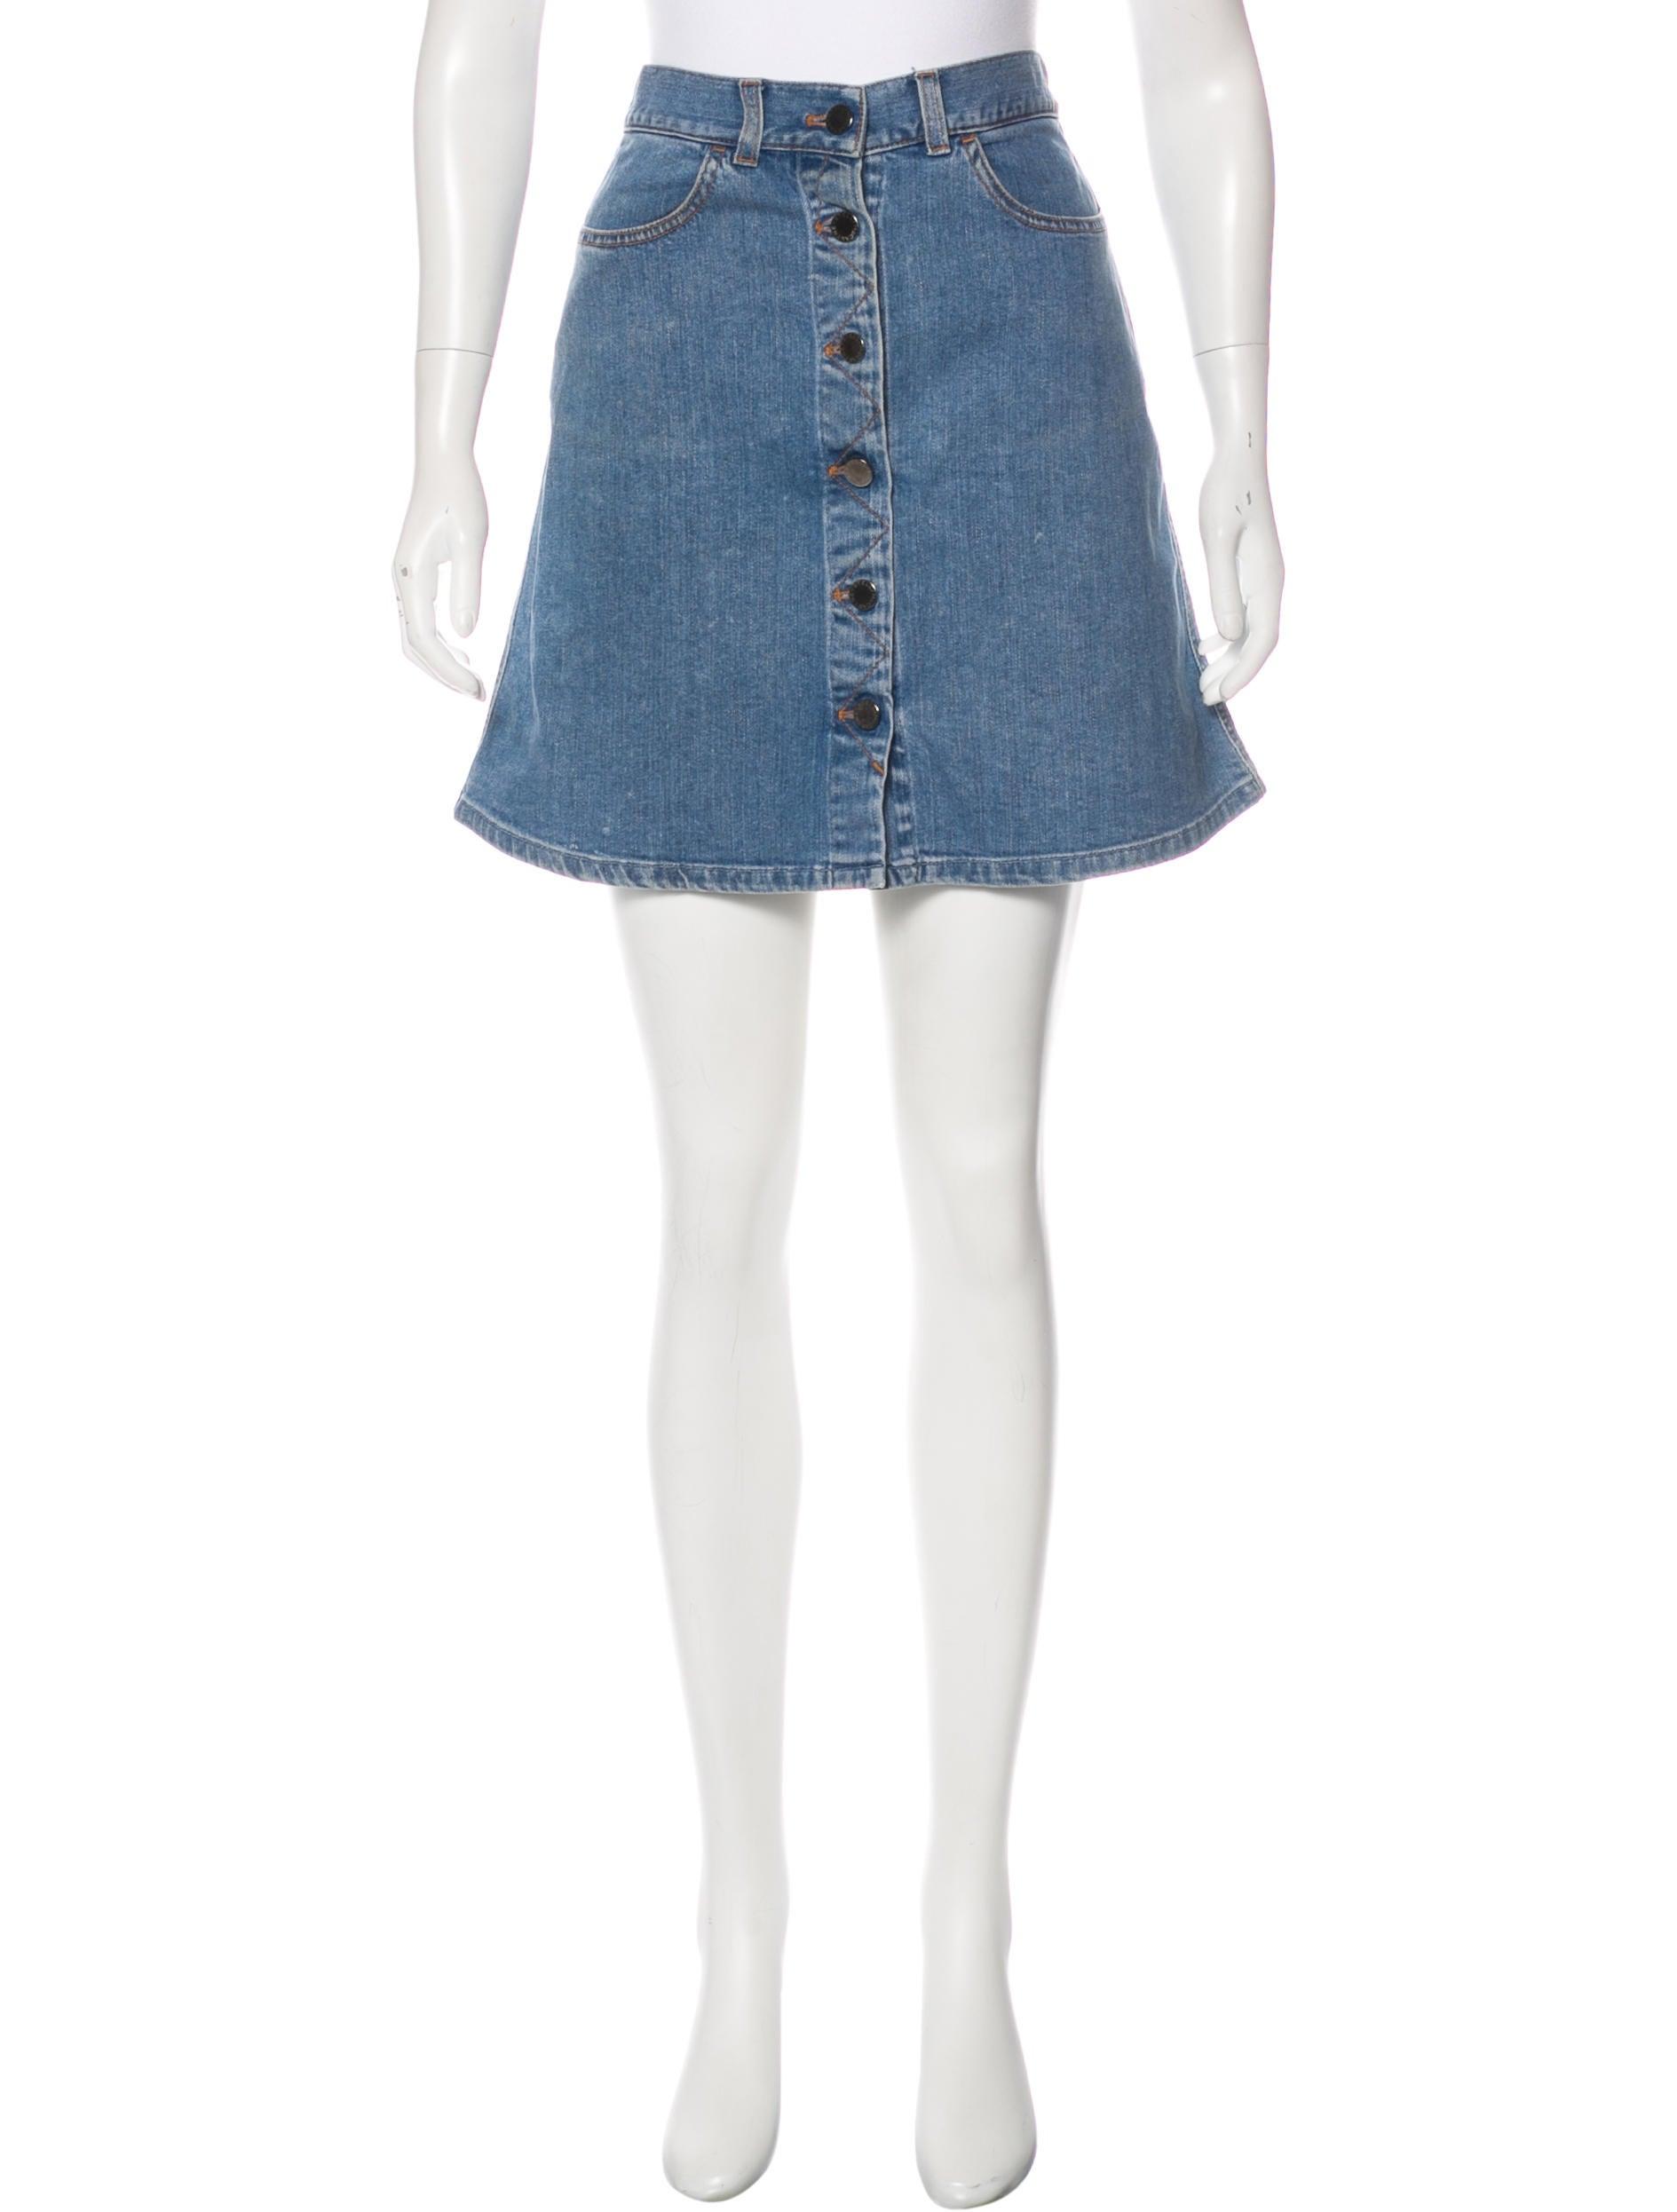 stella mccartney denim mini skirt clothing stl53939